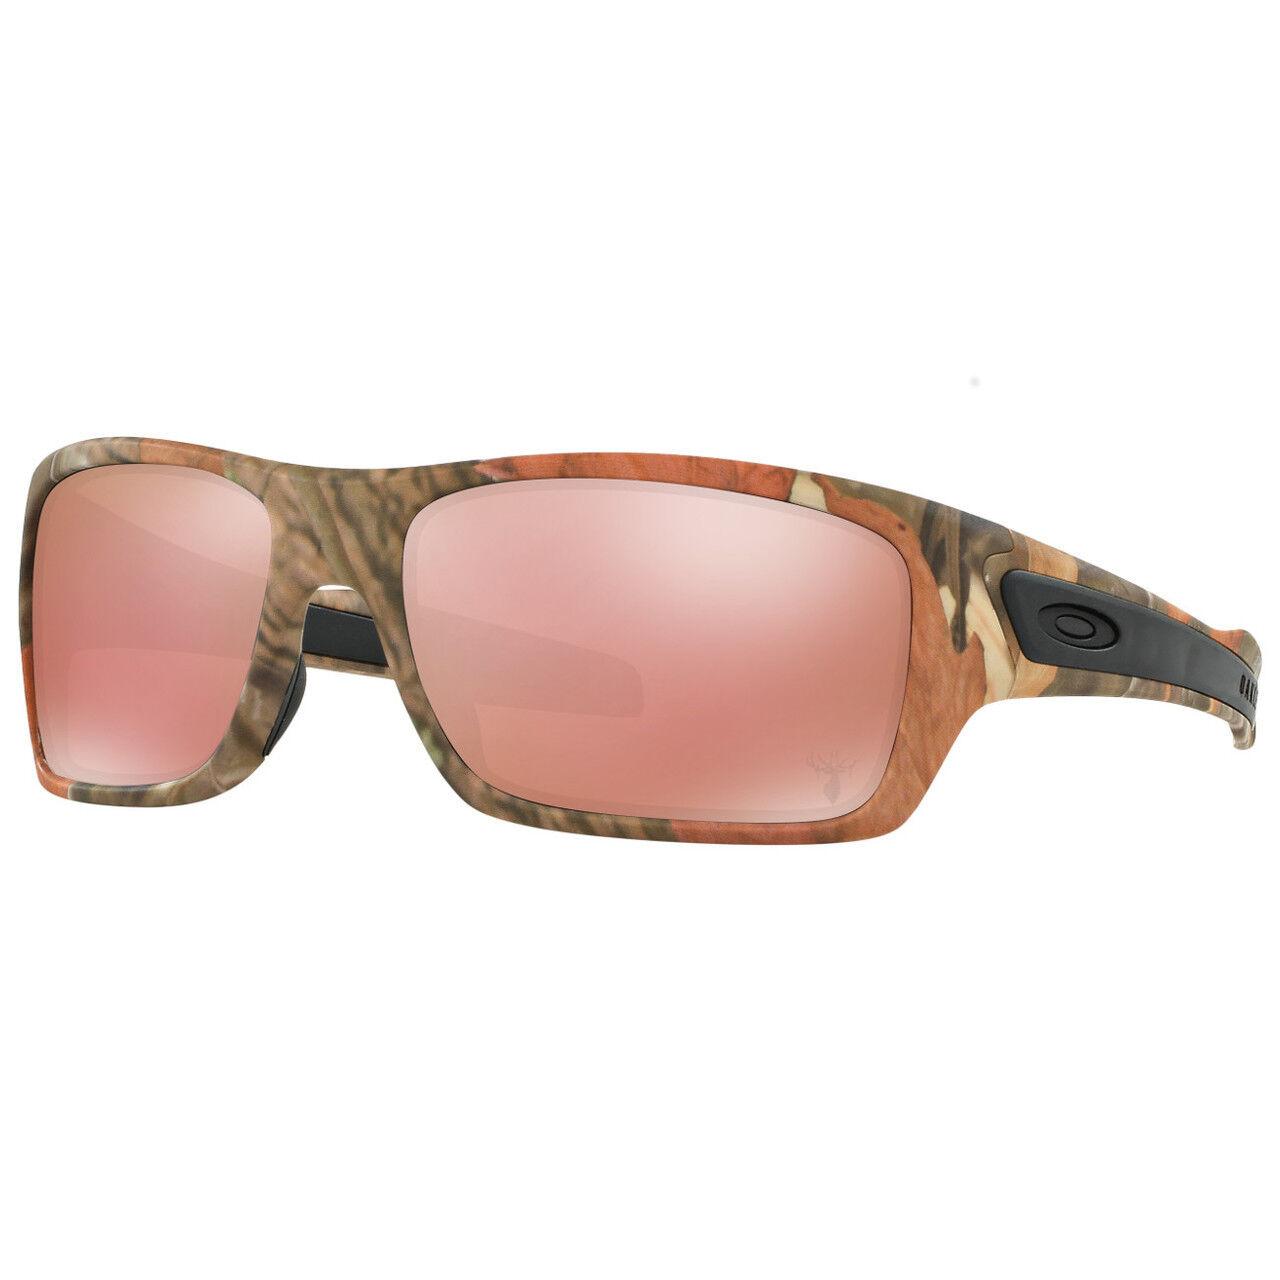 49cafe6788 Oakley Turbine Woodland Camo Vr28 Black Iridium Sports Sunglasses ...